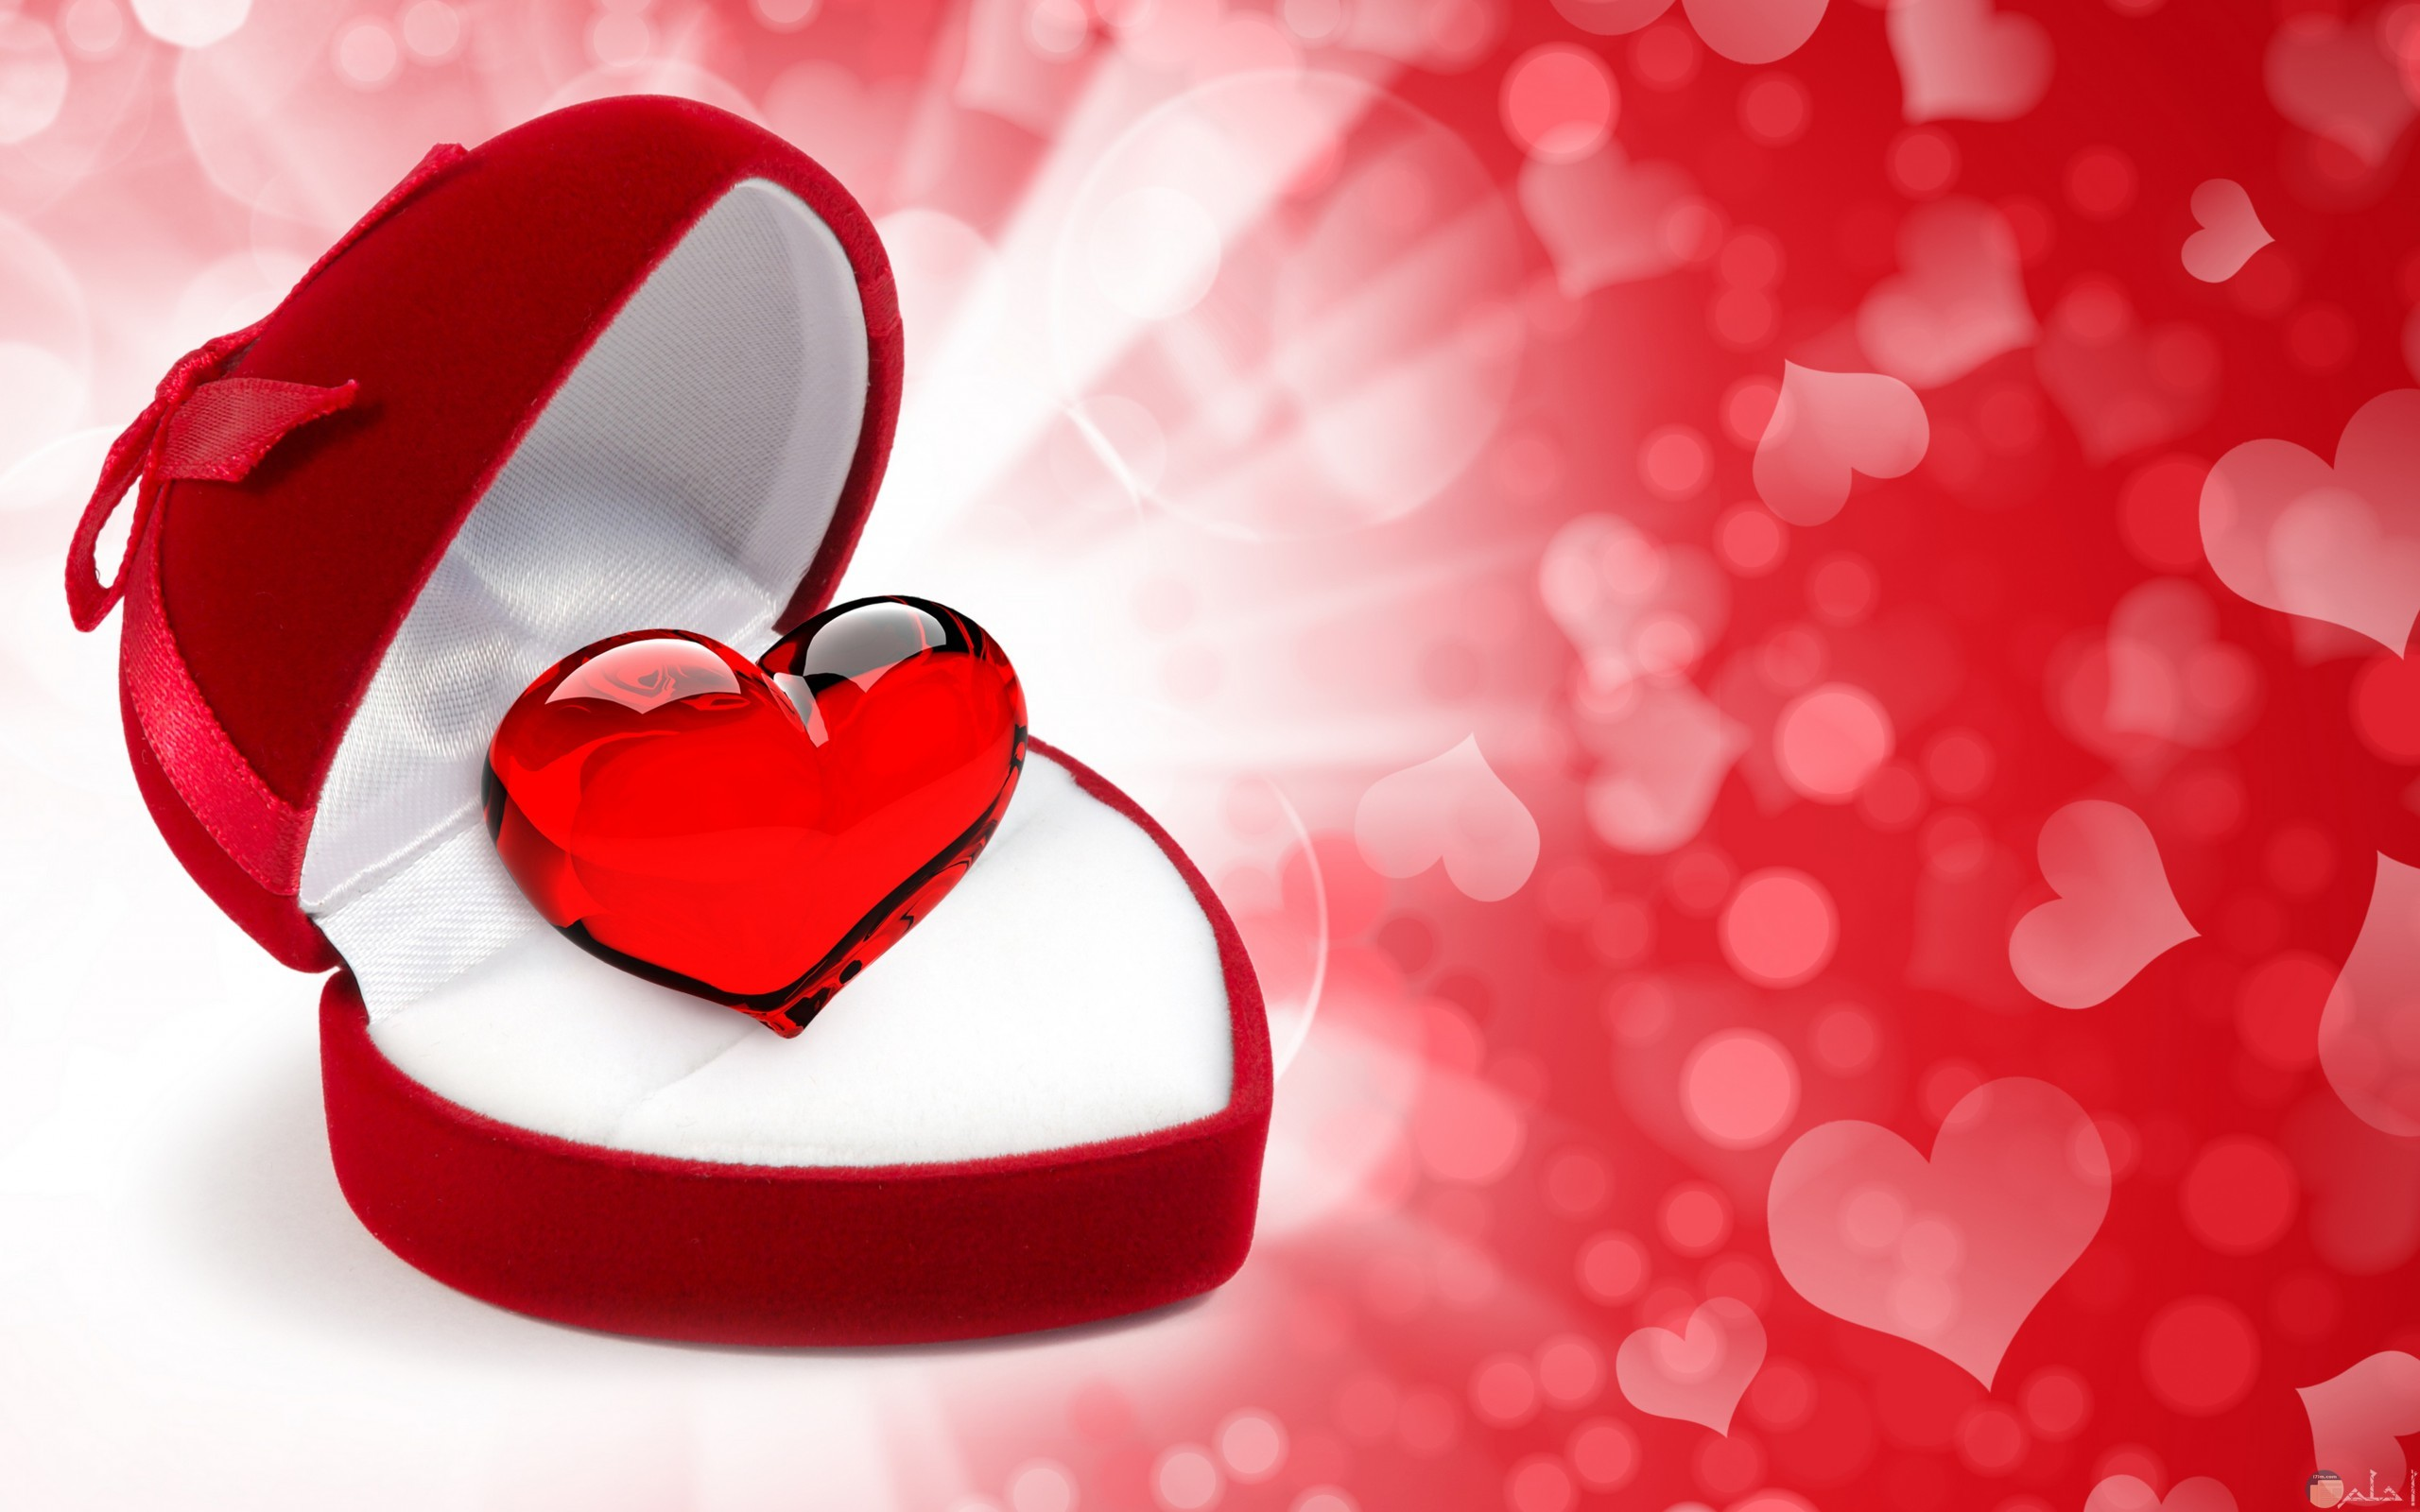 قلب داخل علبة خاتم.